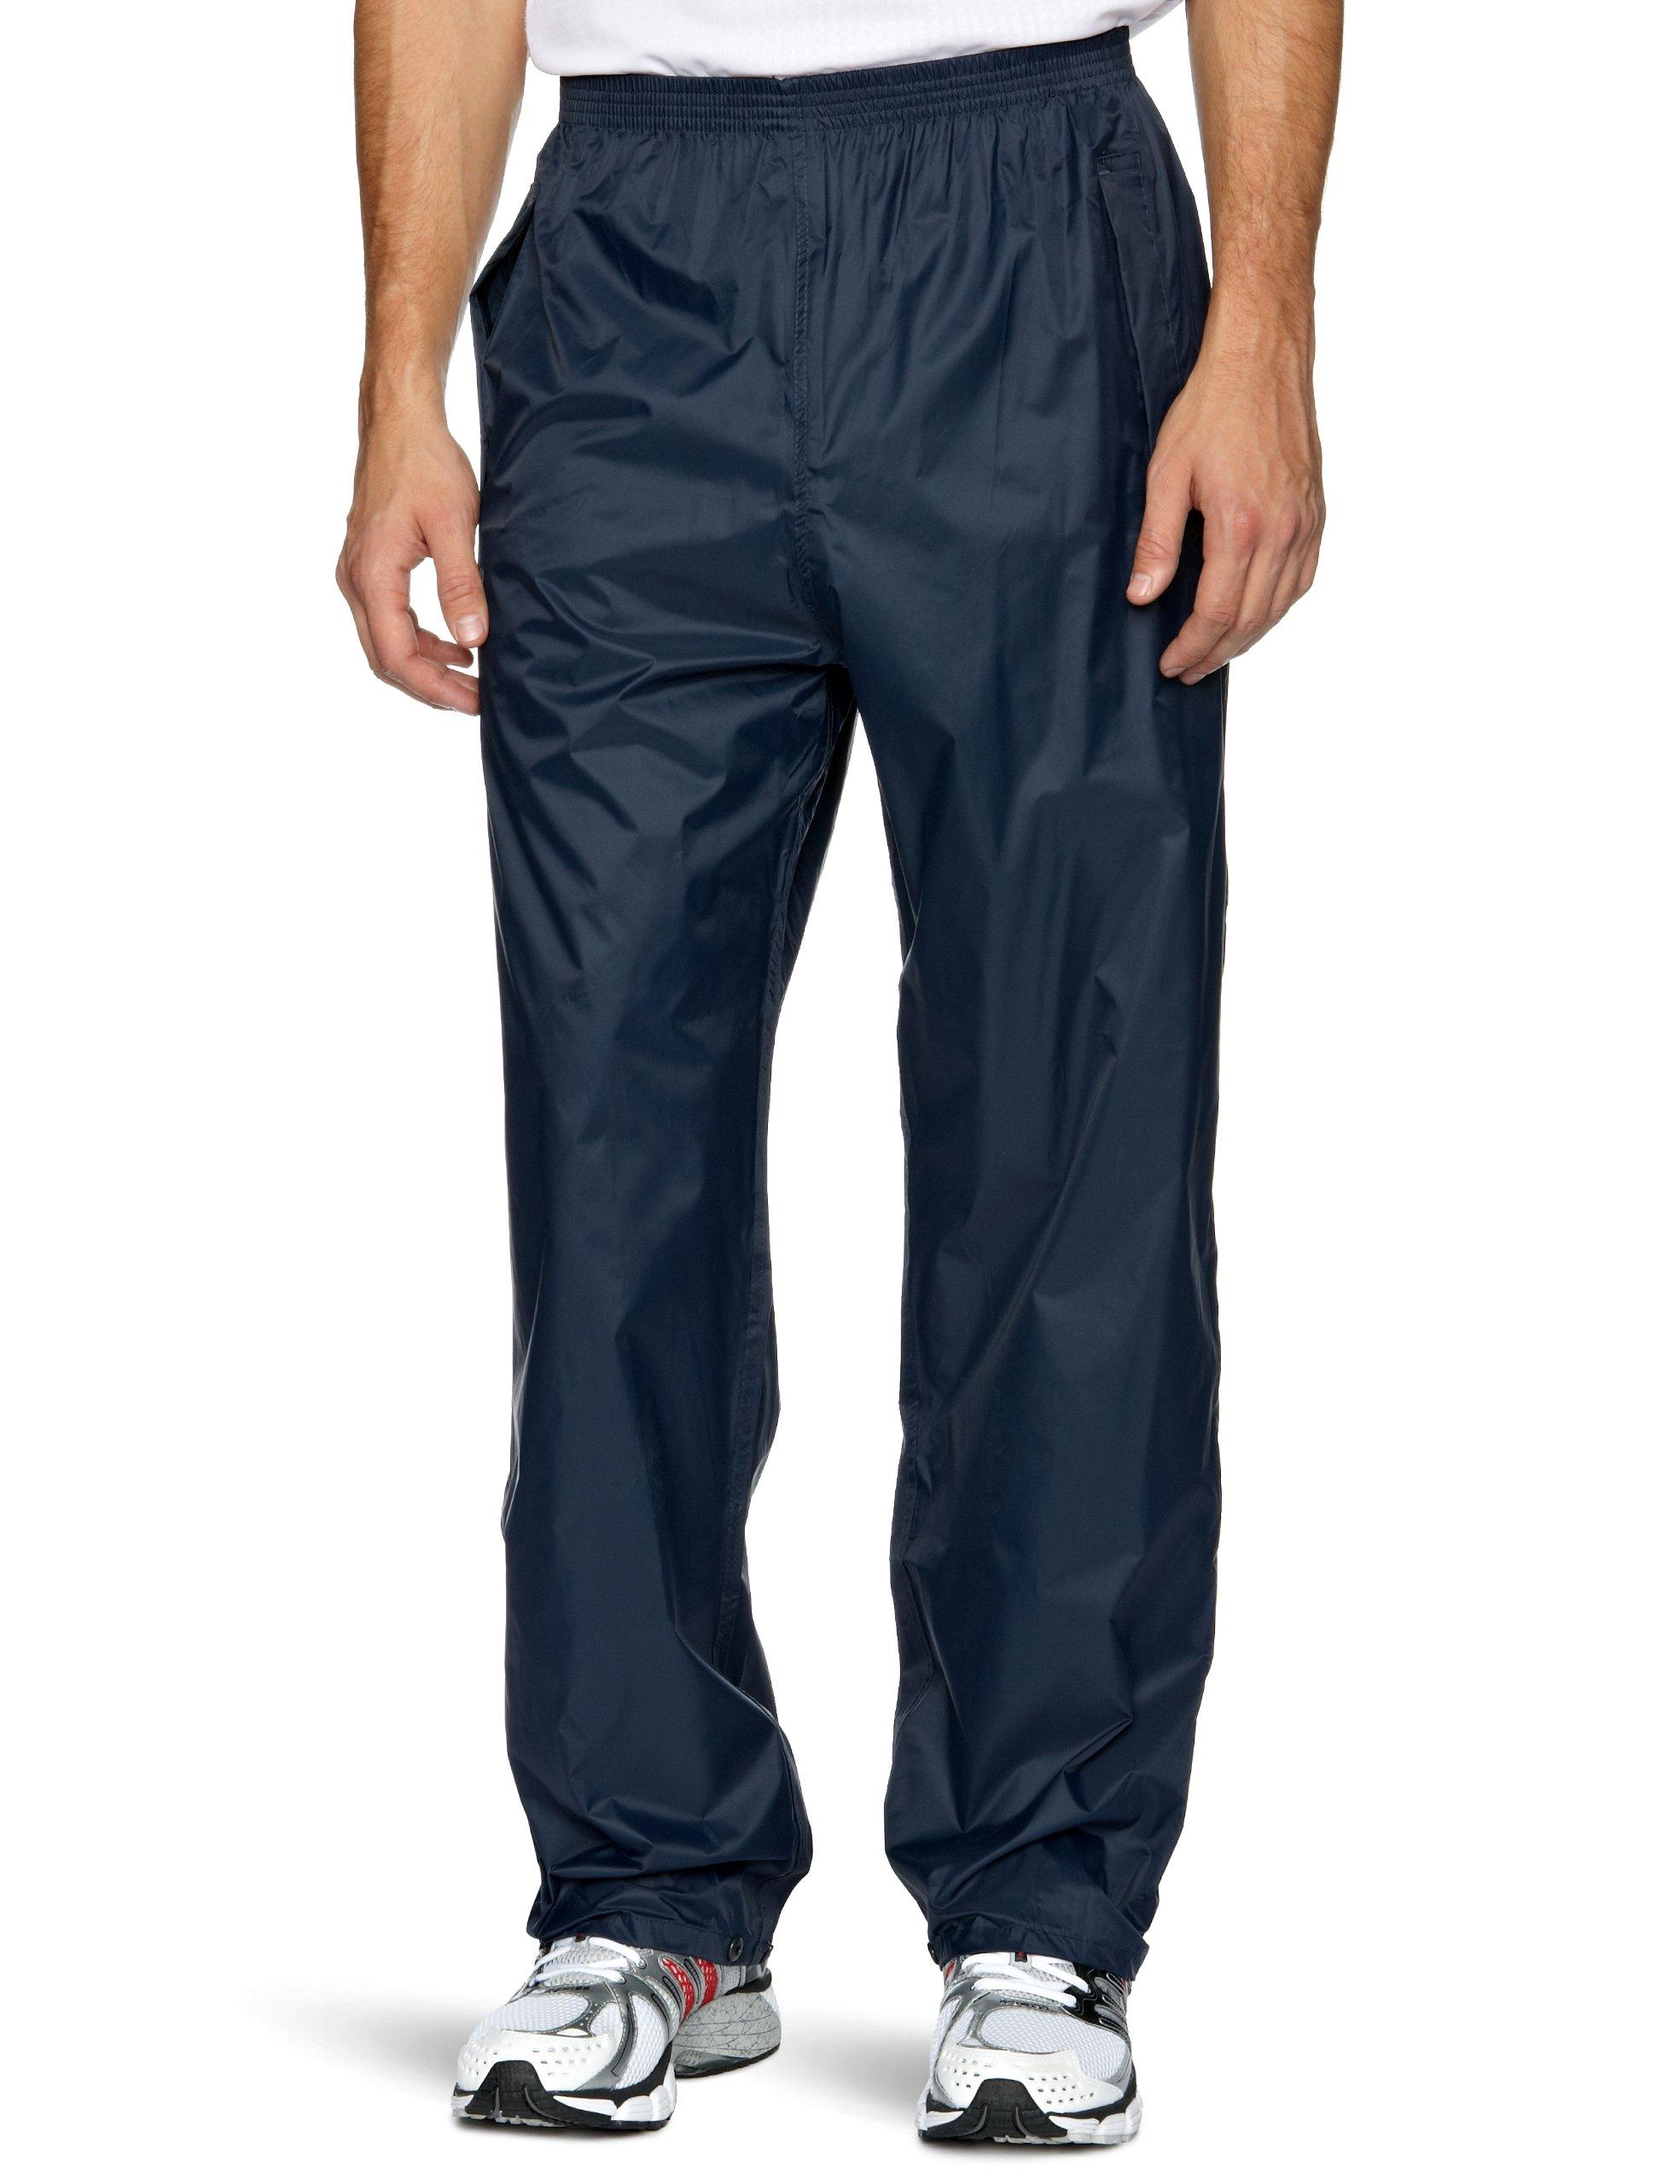 81Mr15pZEnL - Regatta Packaway II Men's Leisurewear OverTrouser